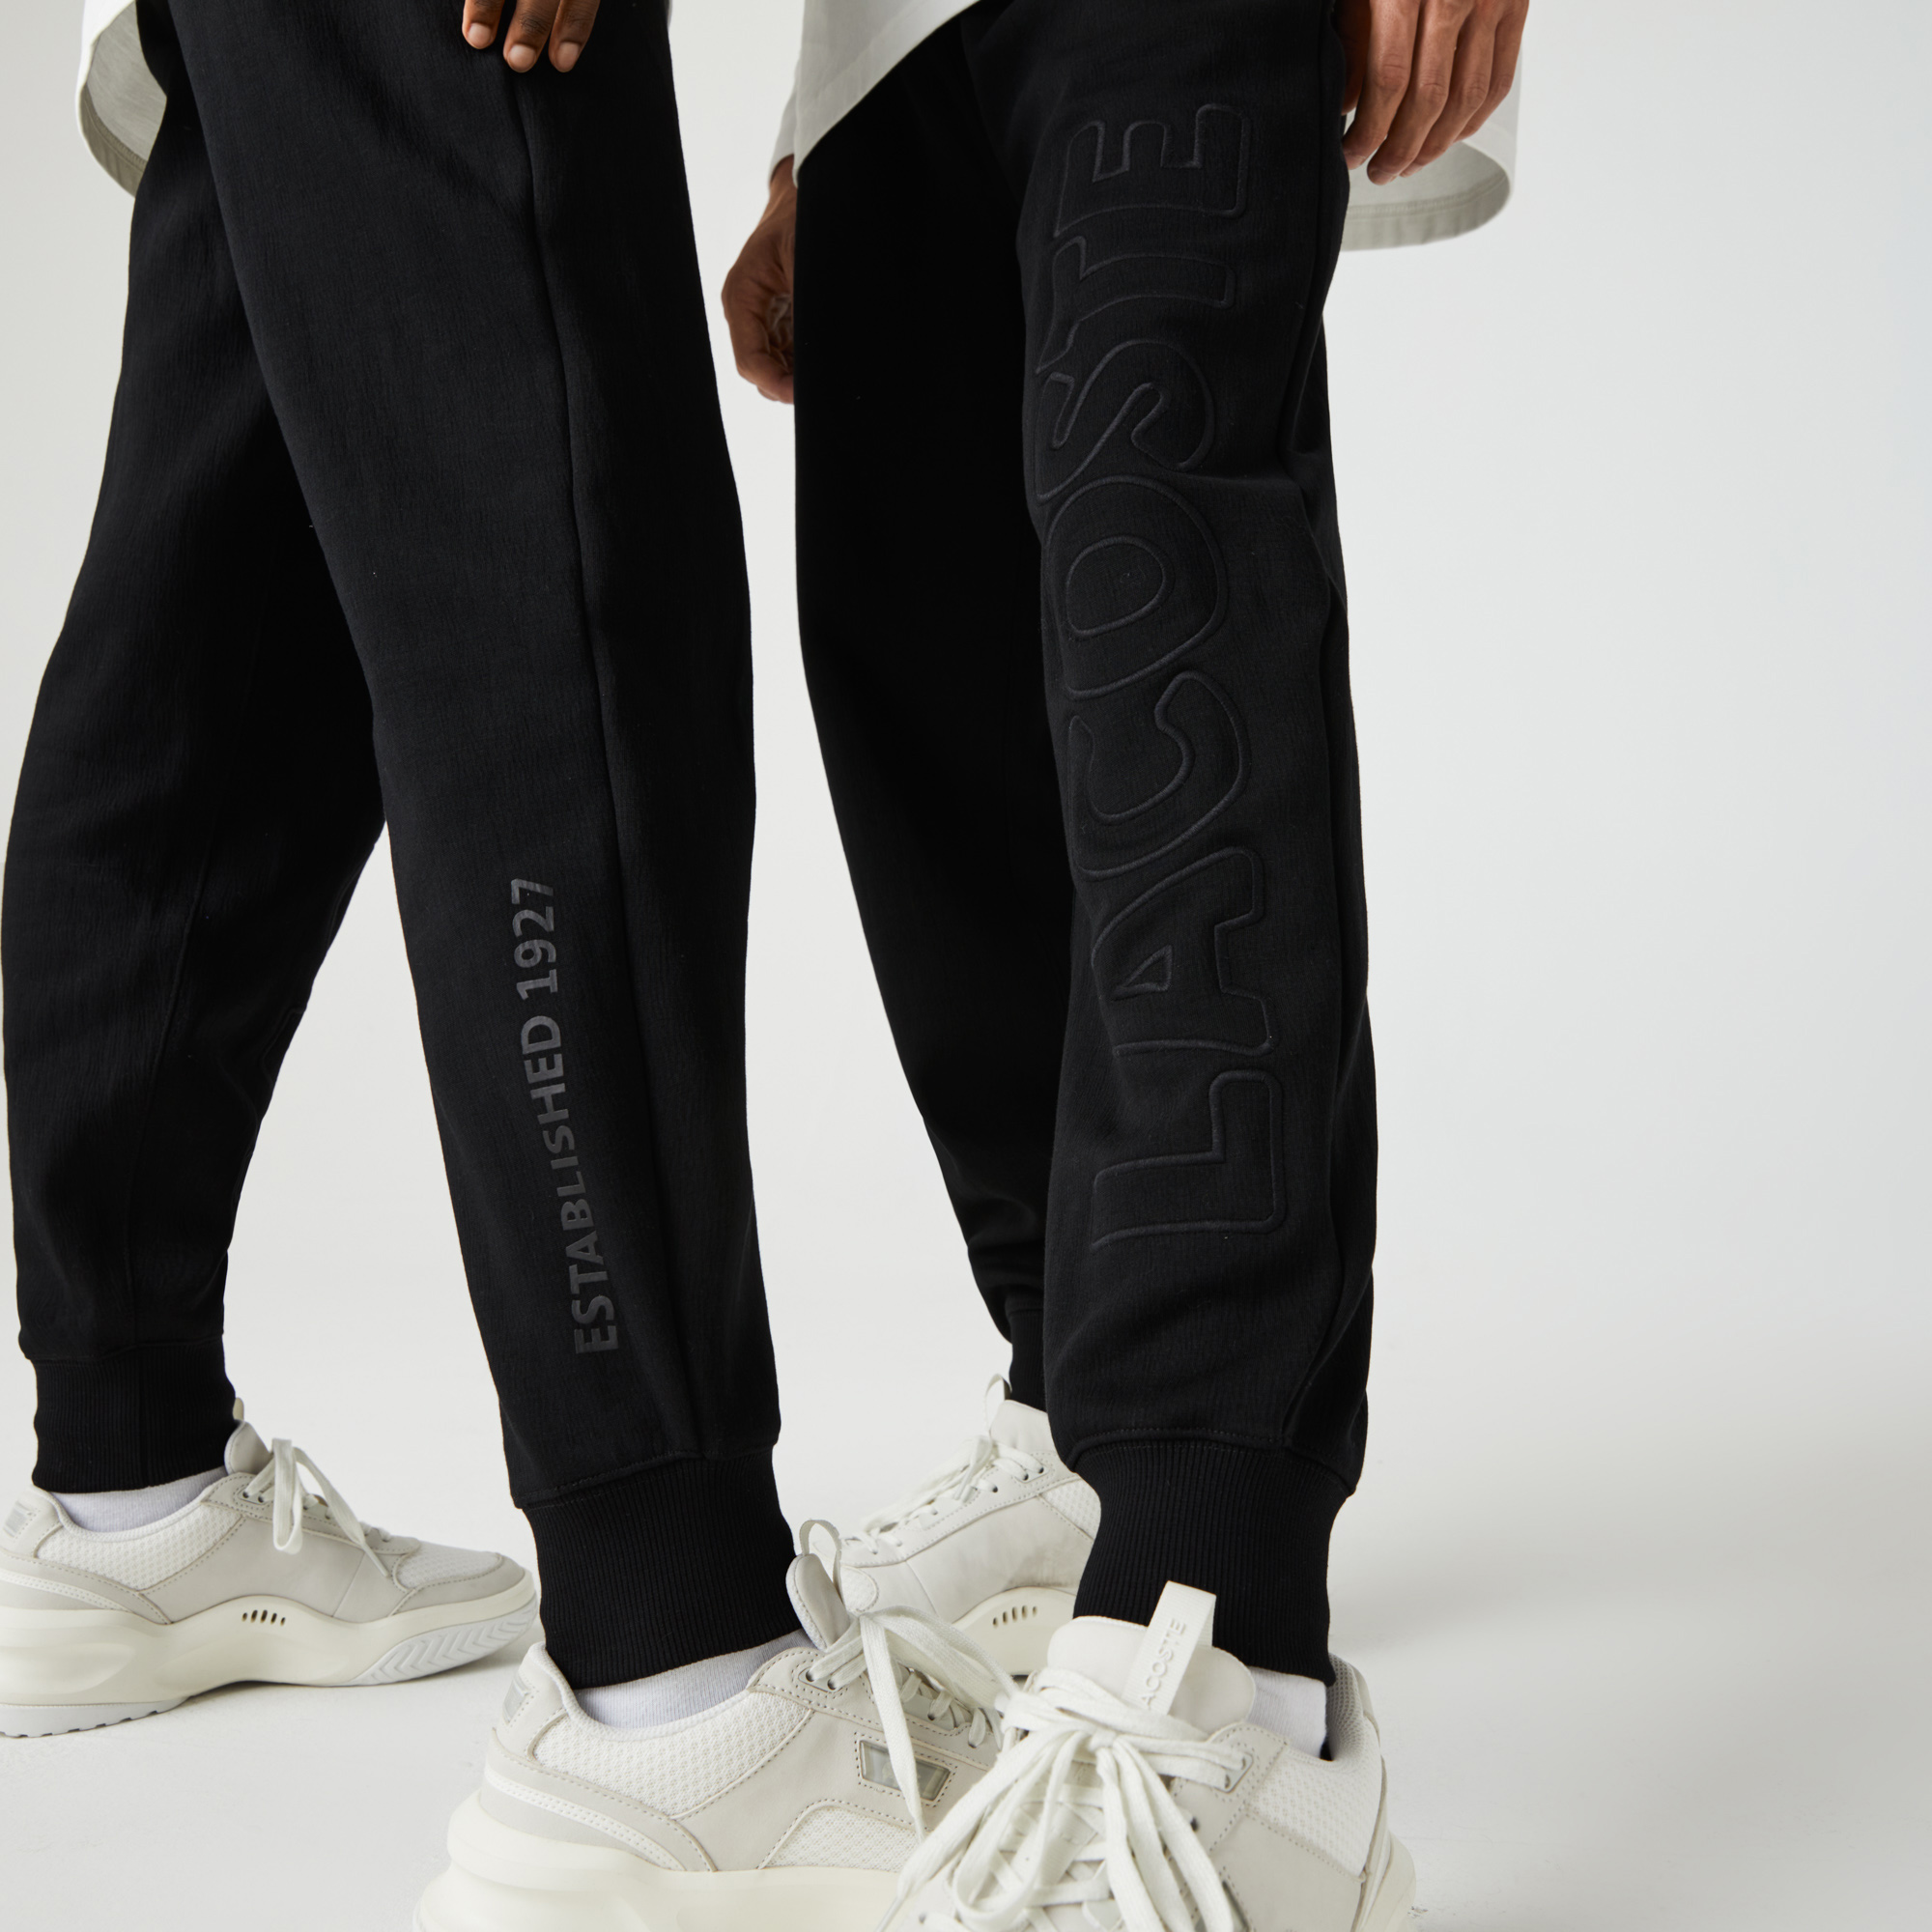 Lacoste Unisex LIVE Embroidered Cotton Blend Tracksuit Pants